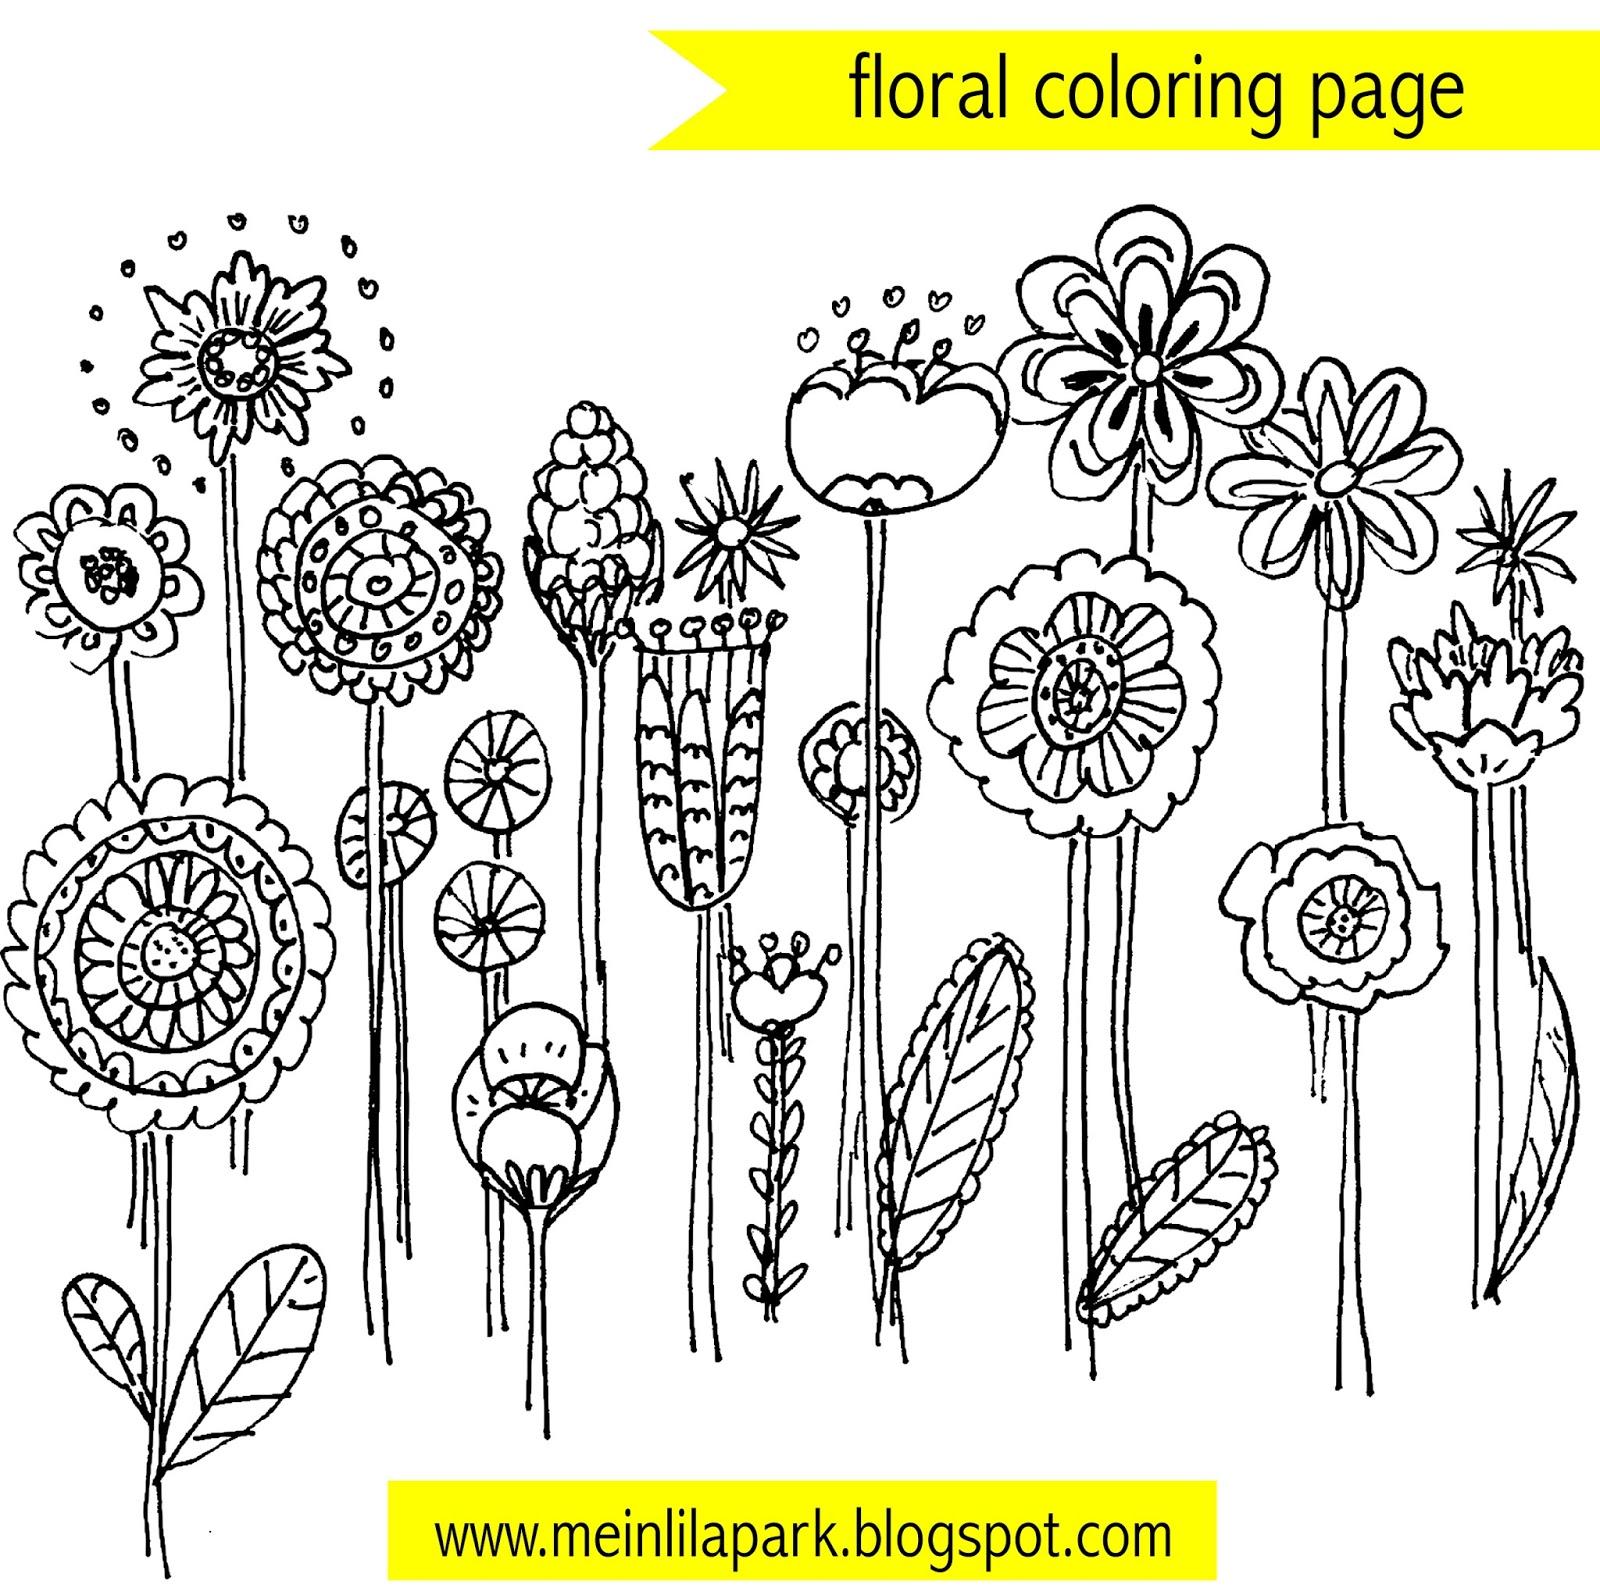 free printable floral coloring page doodles ausmalseite